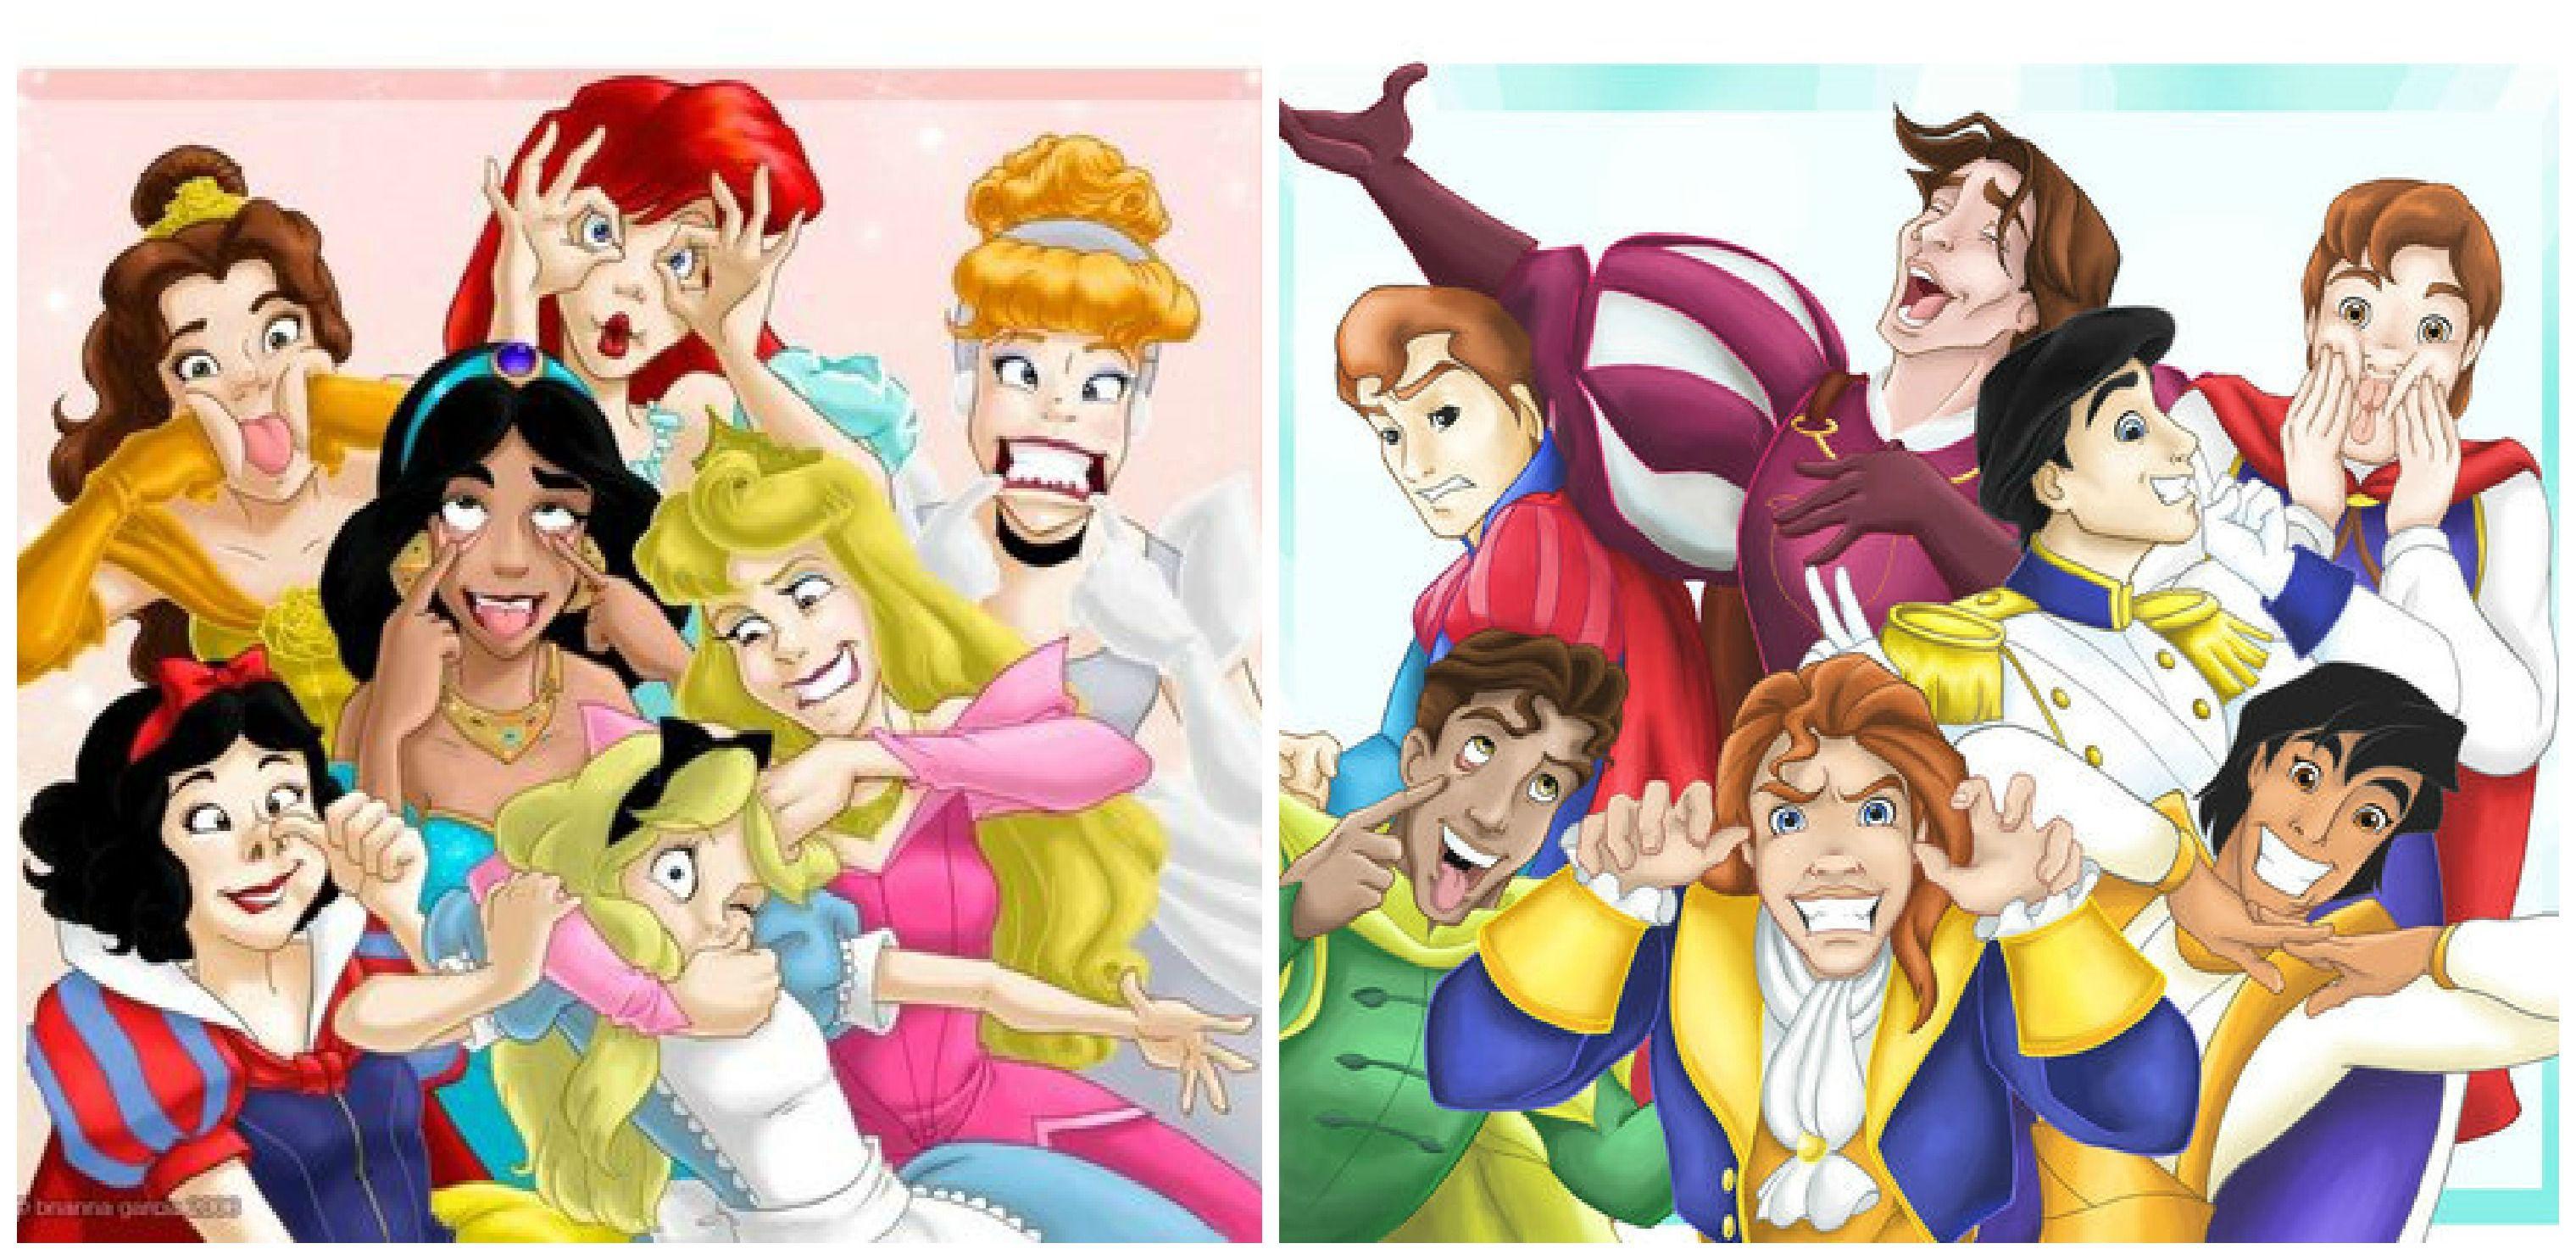 Disney princes and princesses disney pinterest - Prince et princesse disney ...